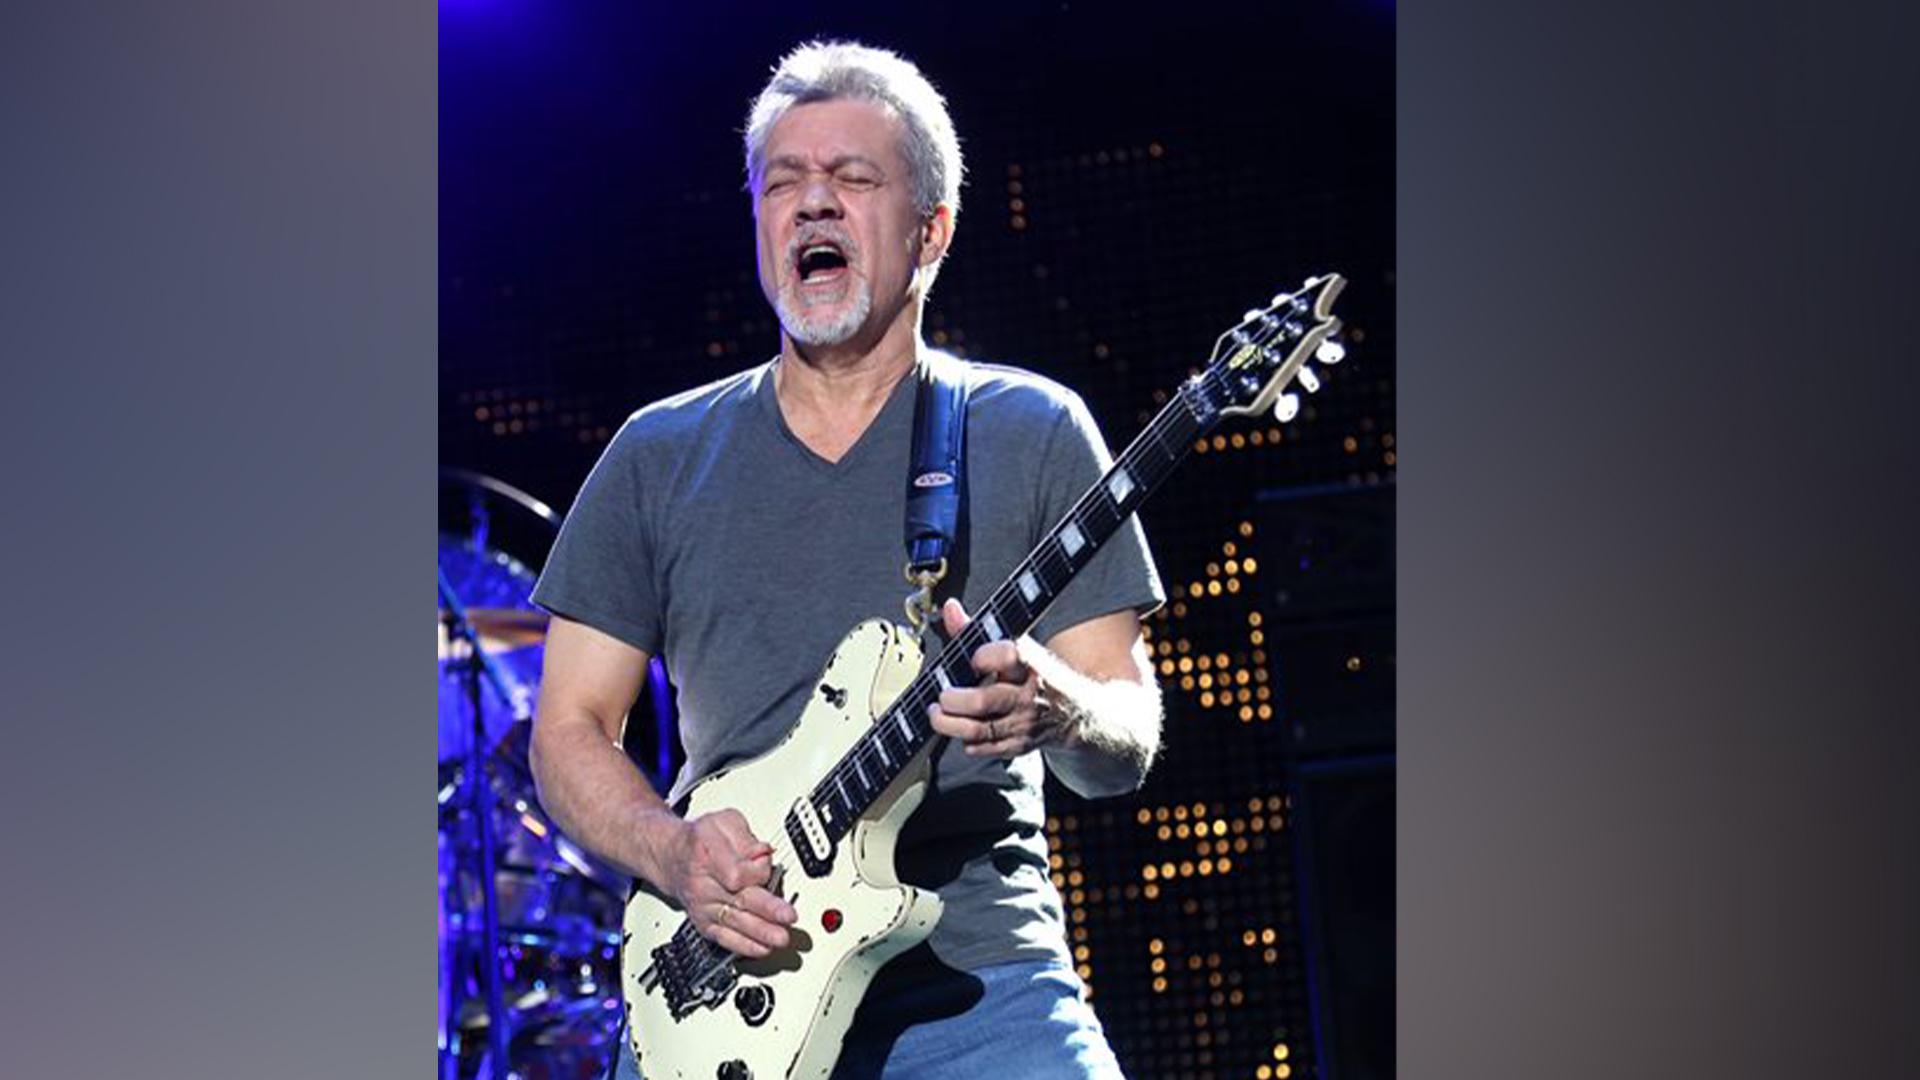 Eddie Van Halen dies of cancer at 65